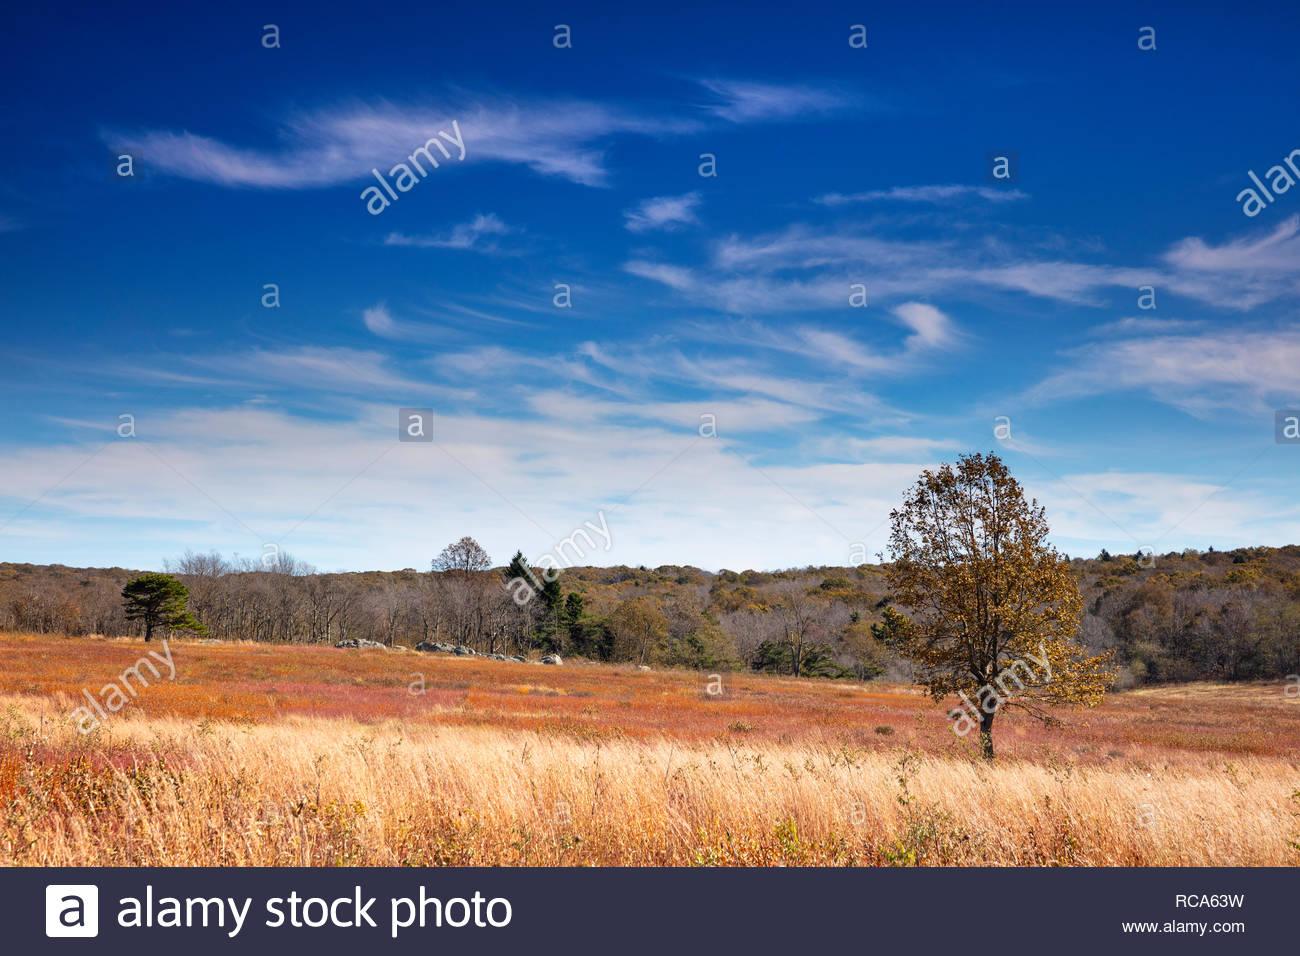 Big Meadows Shenandoah National Park Stock Photos & Big